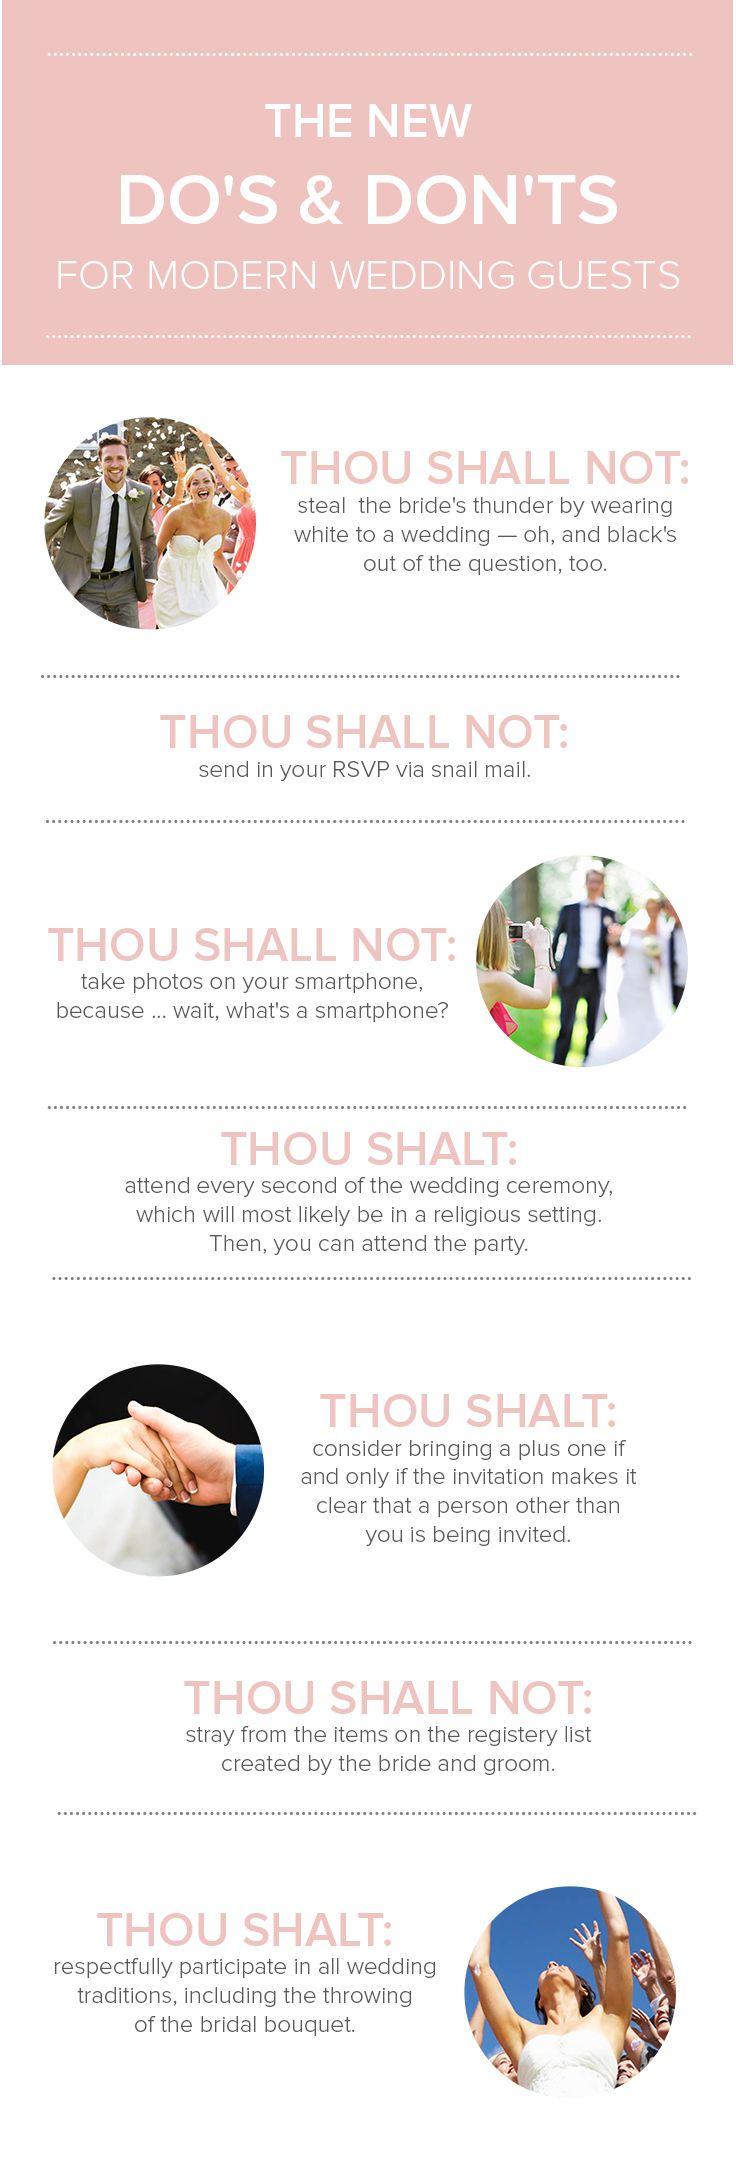 bridal shower invitations registry etiquette%0A   new do u    s and don u    ts for modern weddings  Wedding Guest EtiquetteWedding